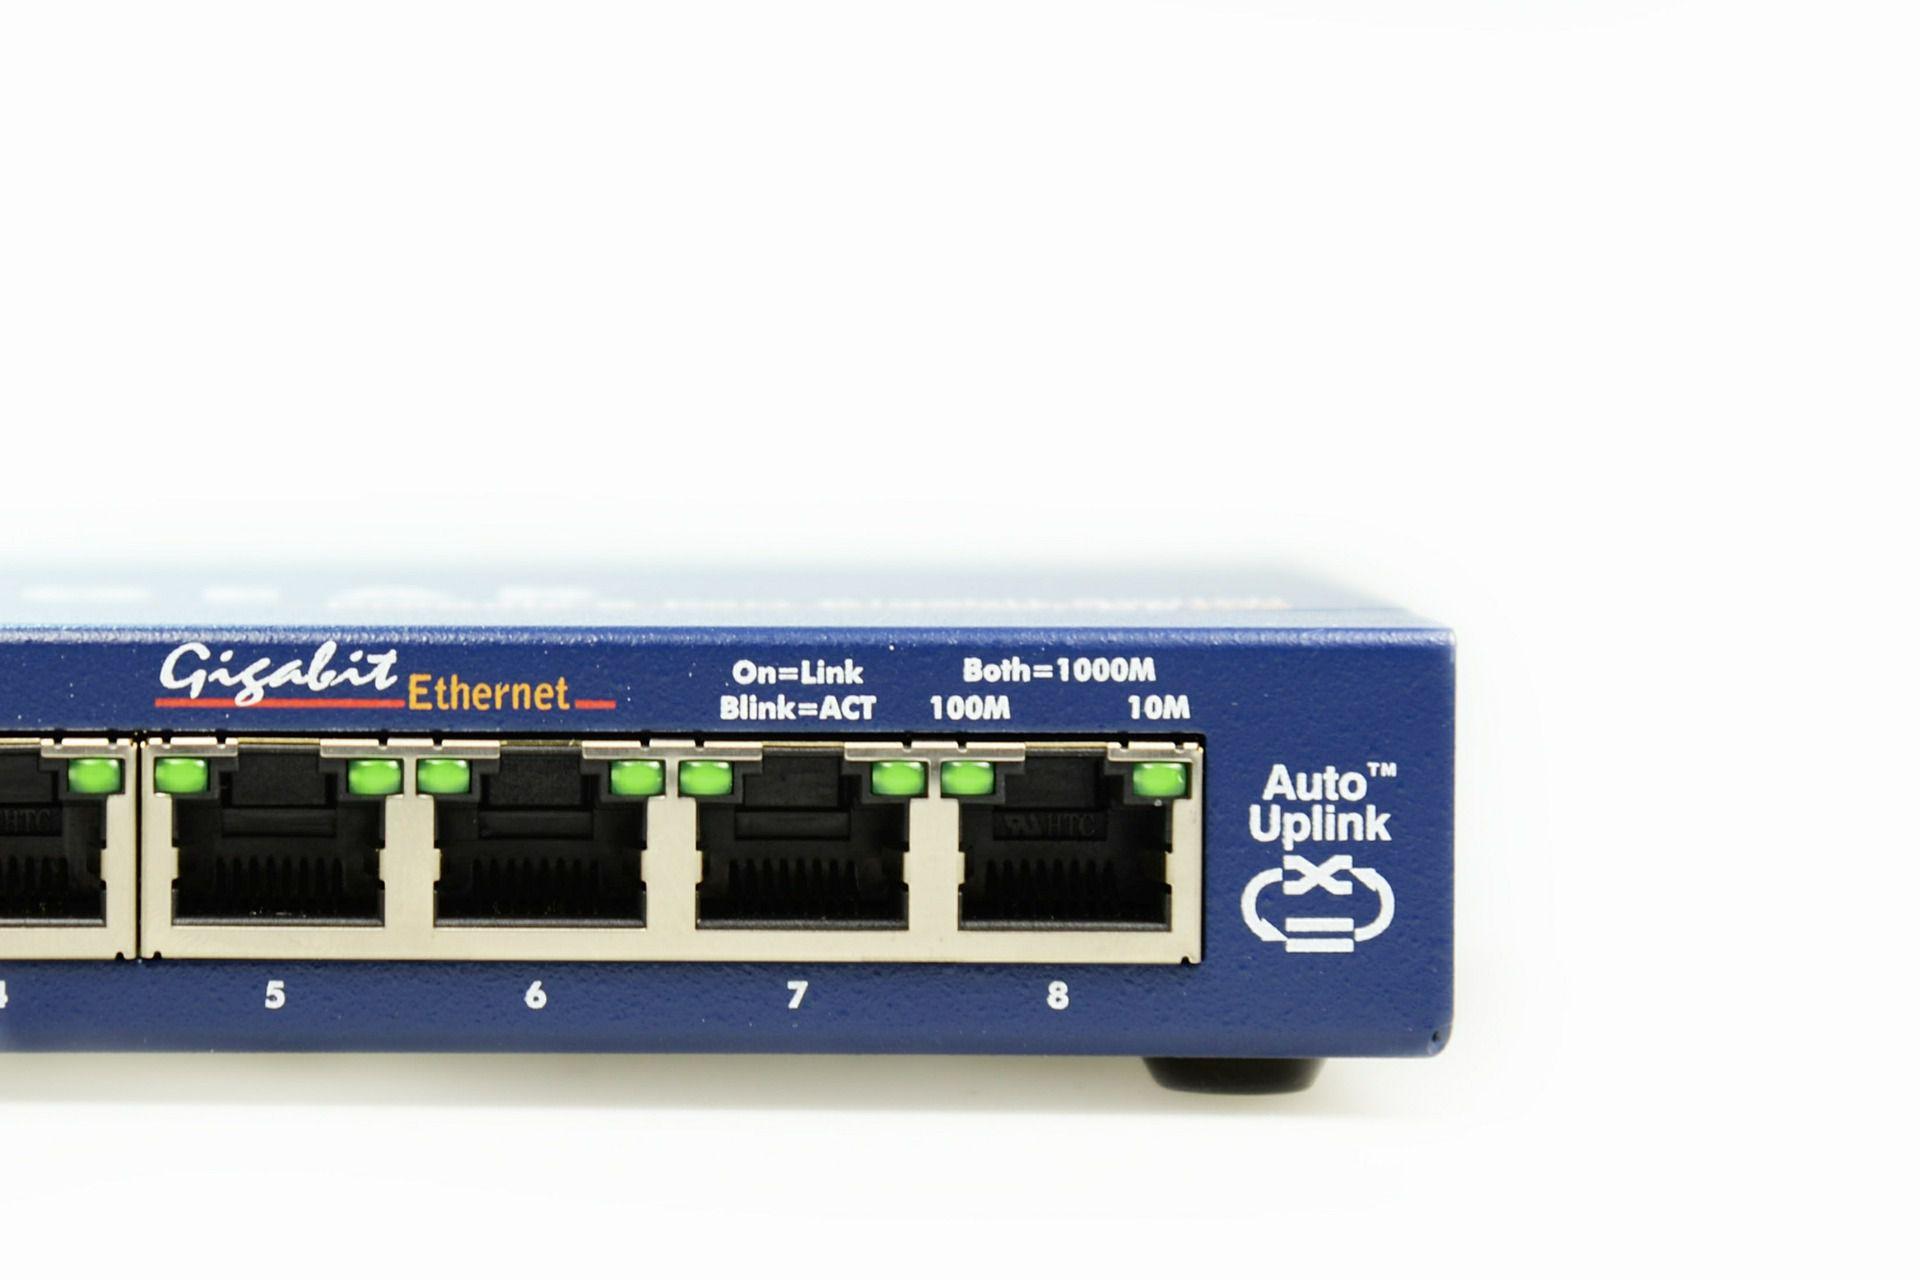 hight resolution of gigabit ethernet switch